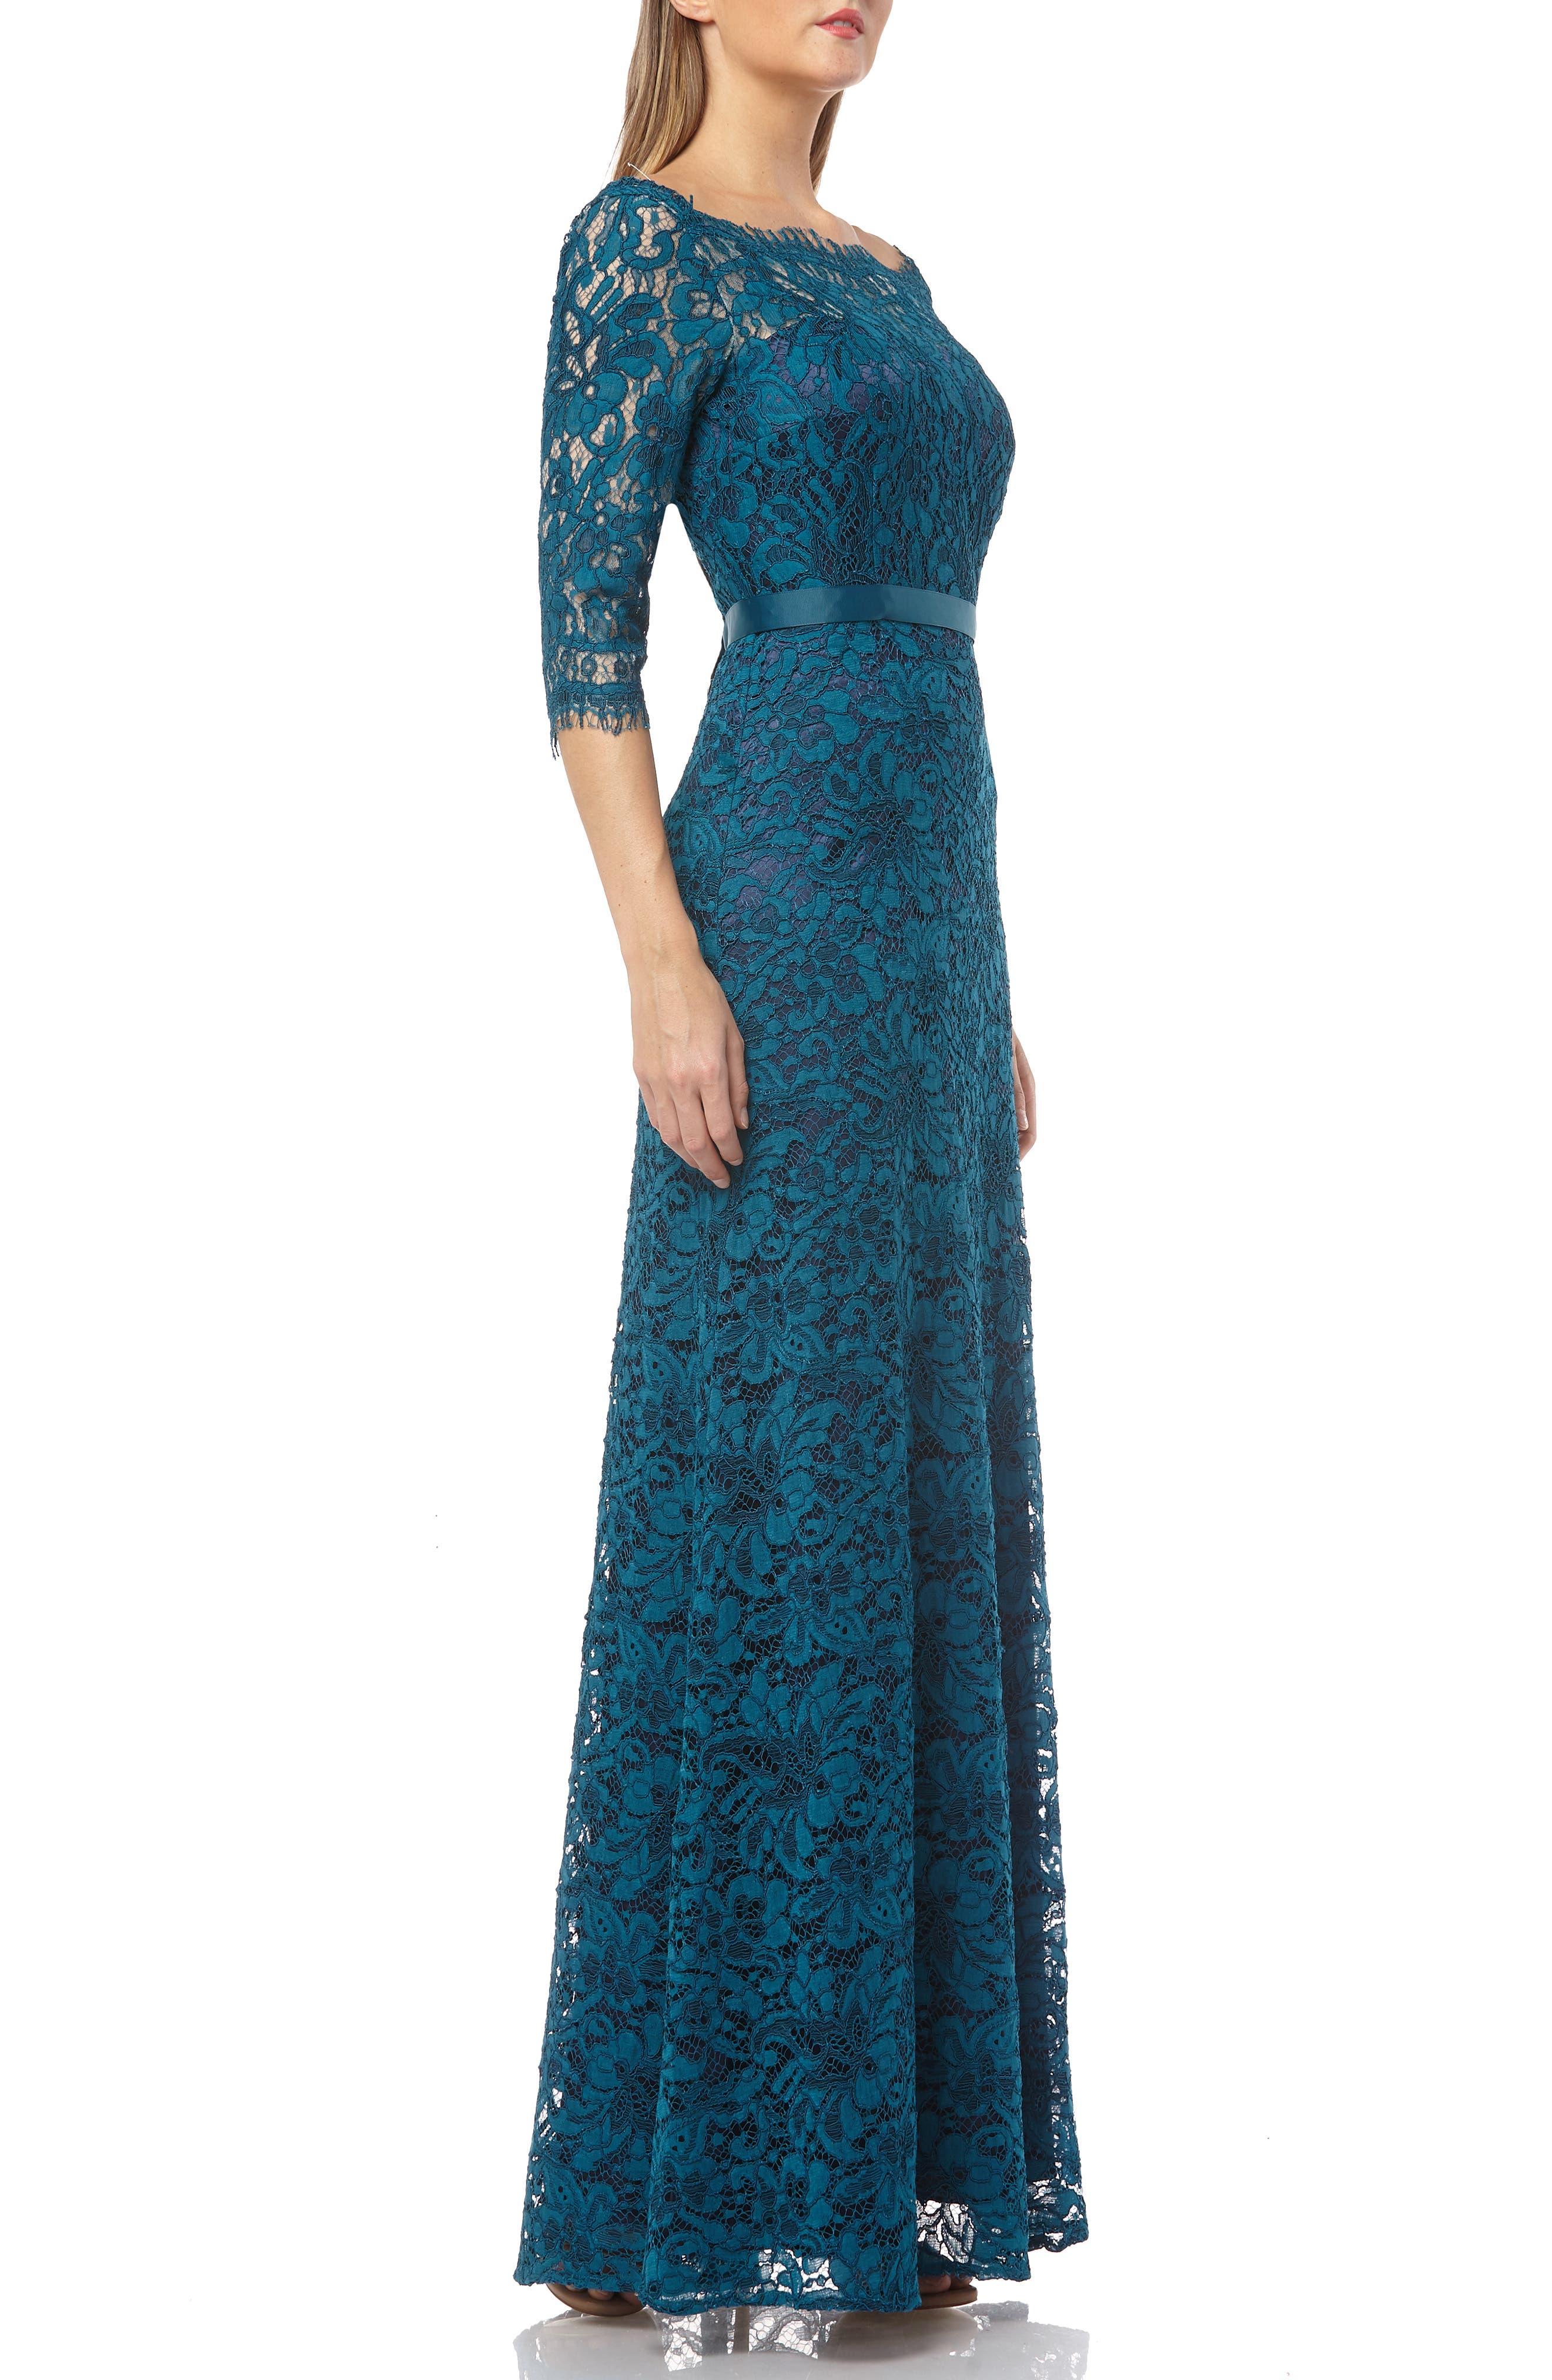 JS COLLECTIONS,                             Bateau Neck Lace Gown,                             Alternate thumbnail 3, color,                             TURQOISE NAVY